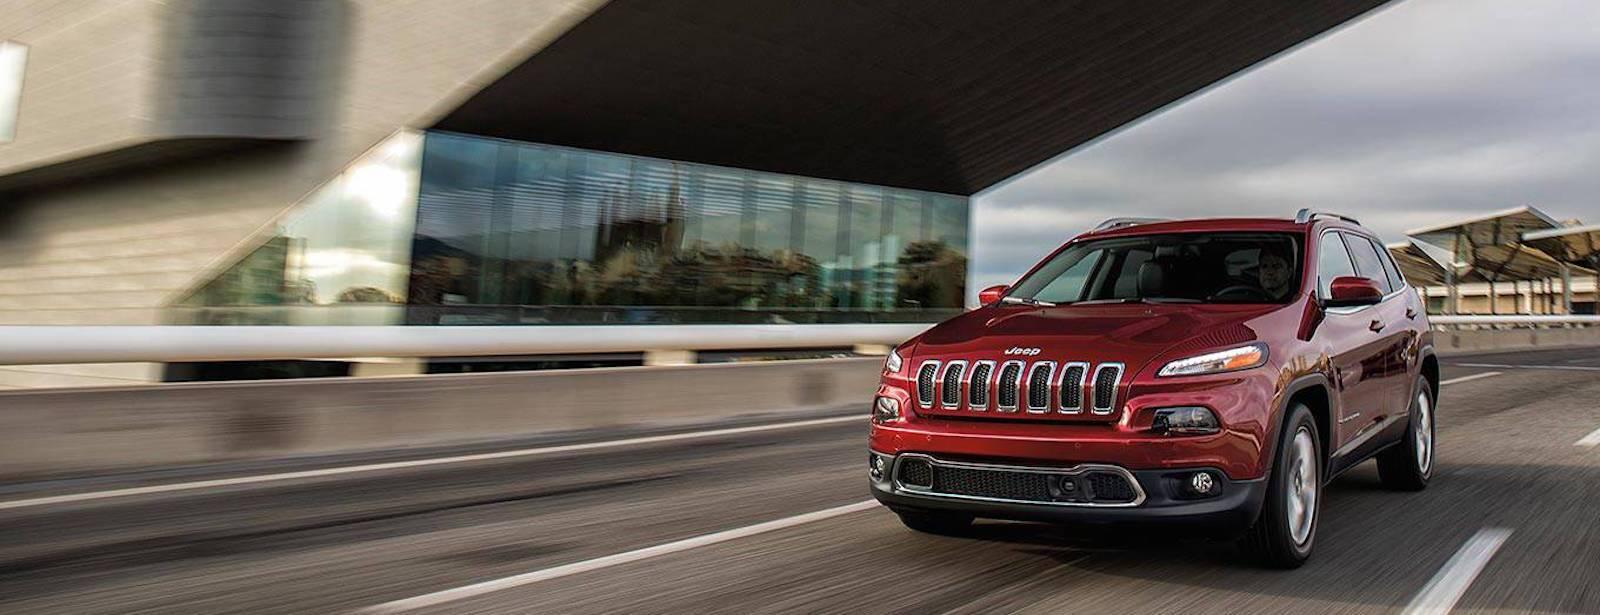 2016 Jeep Cherokee Style